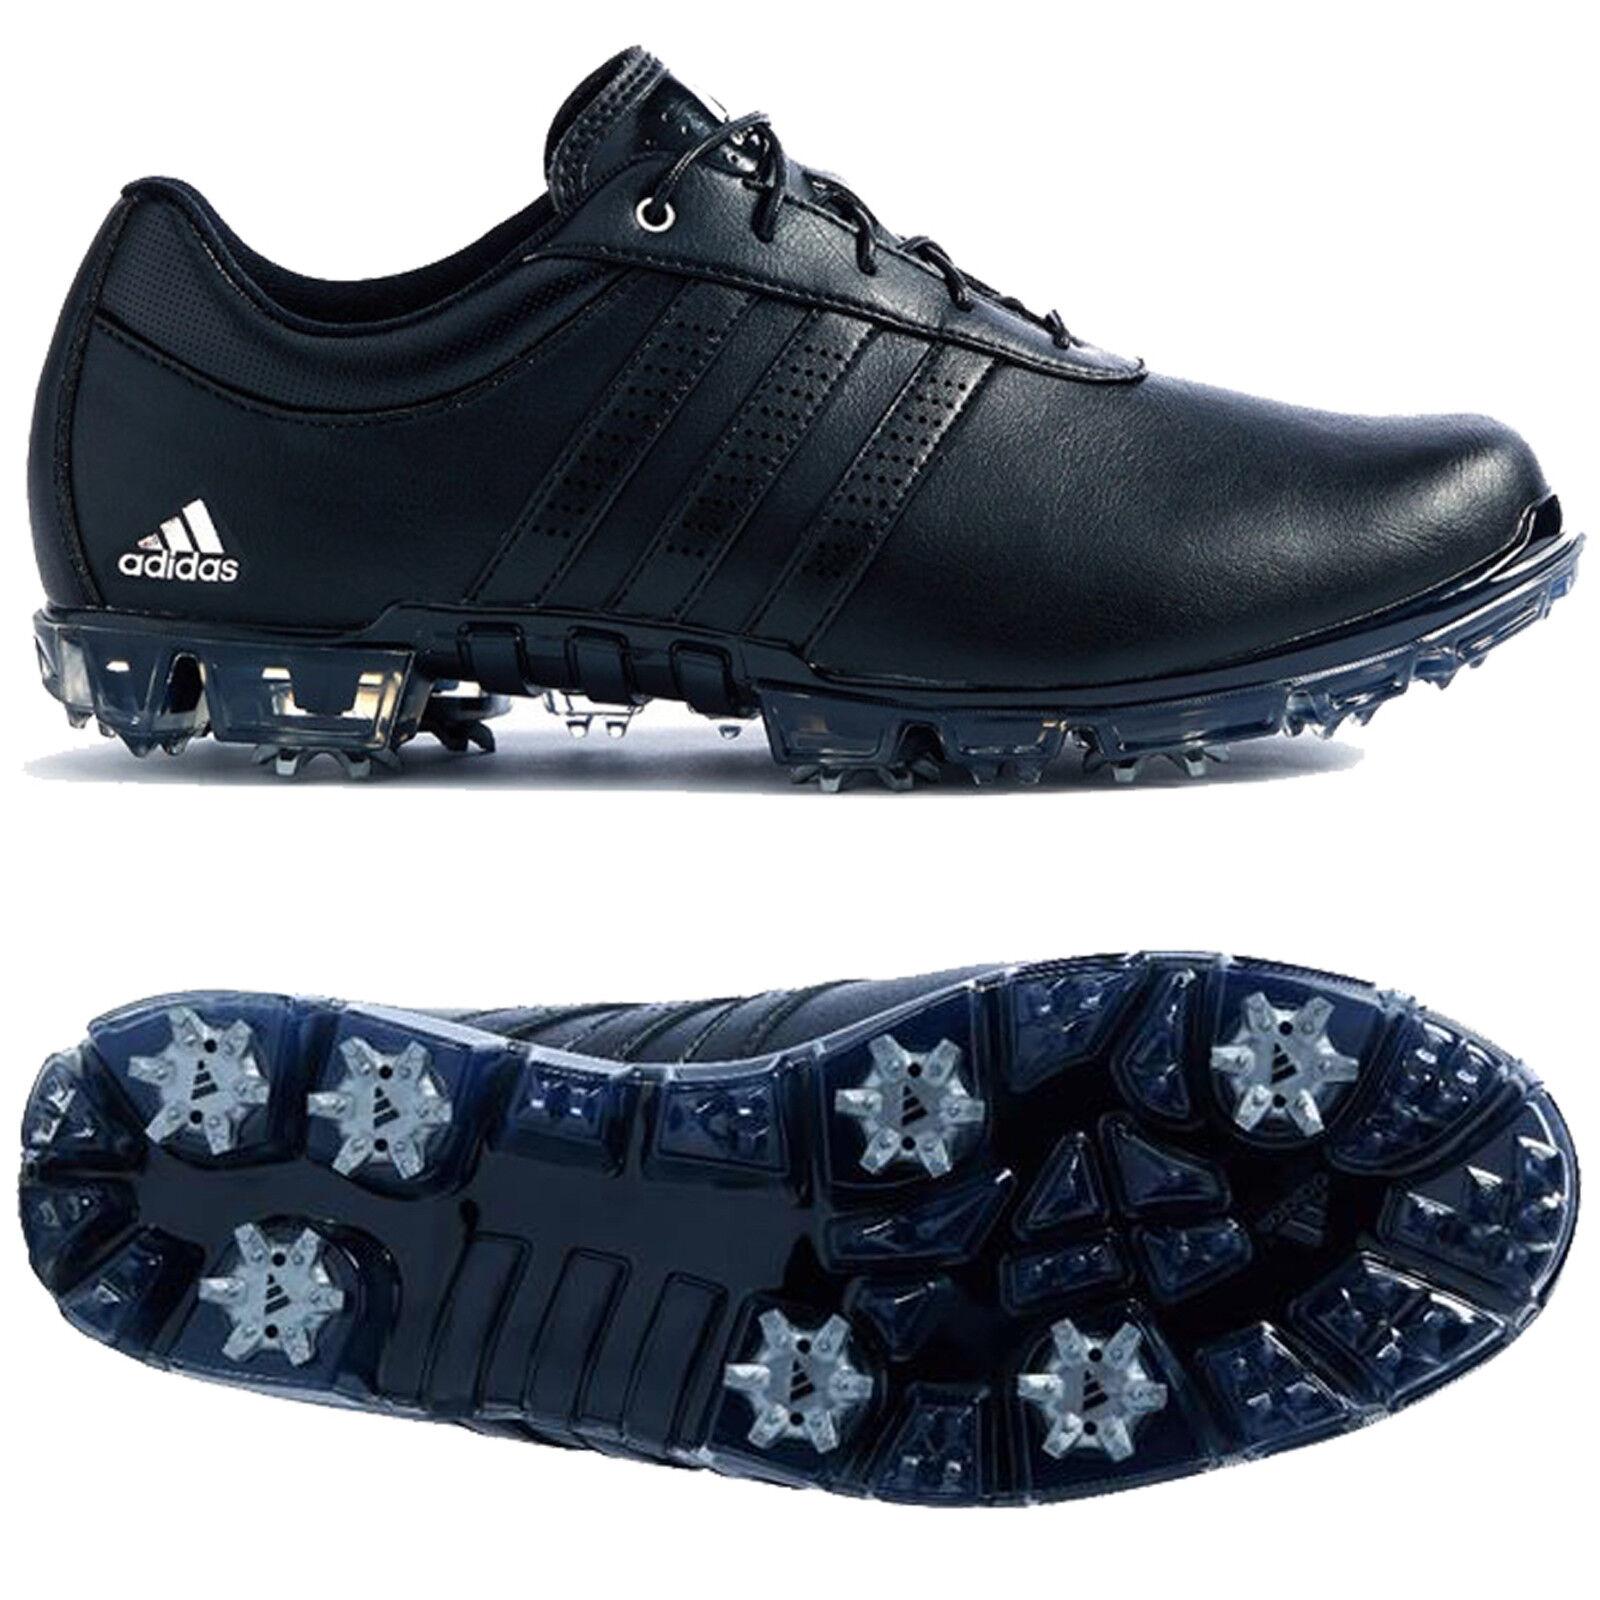 Adidas Mens 2018 Adipure Flex Spiked Waterproof Golf Schuhes schwarz